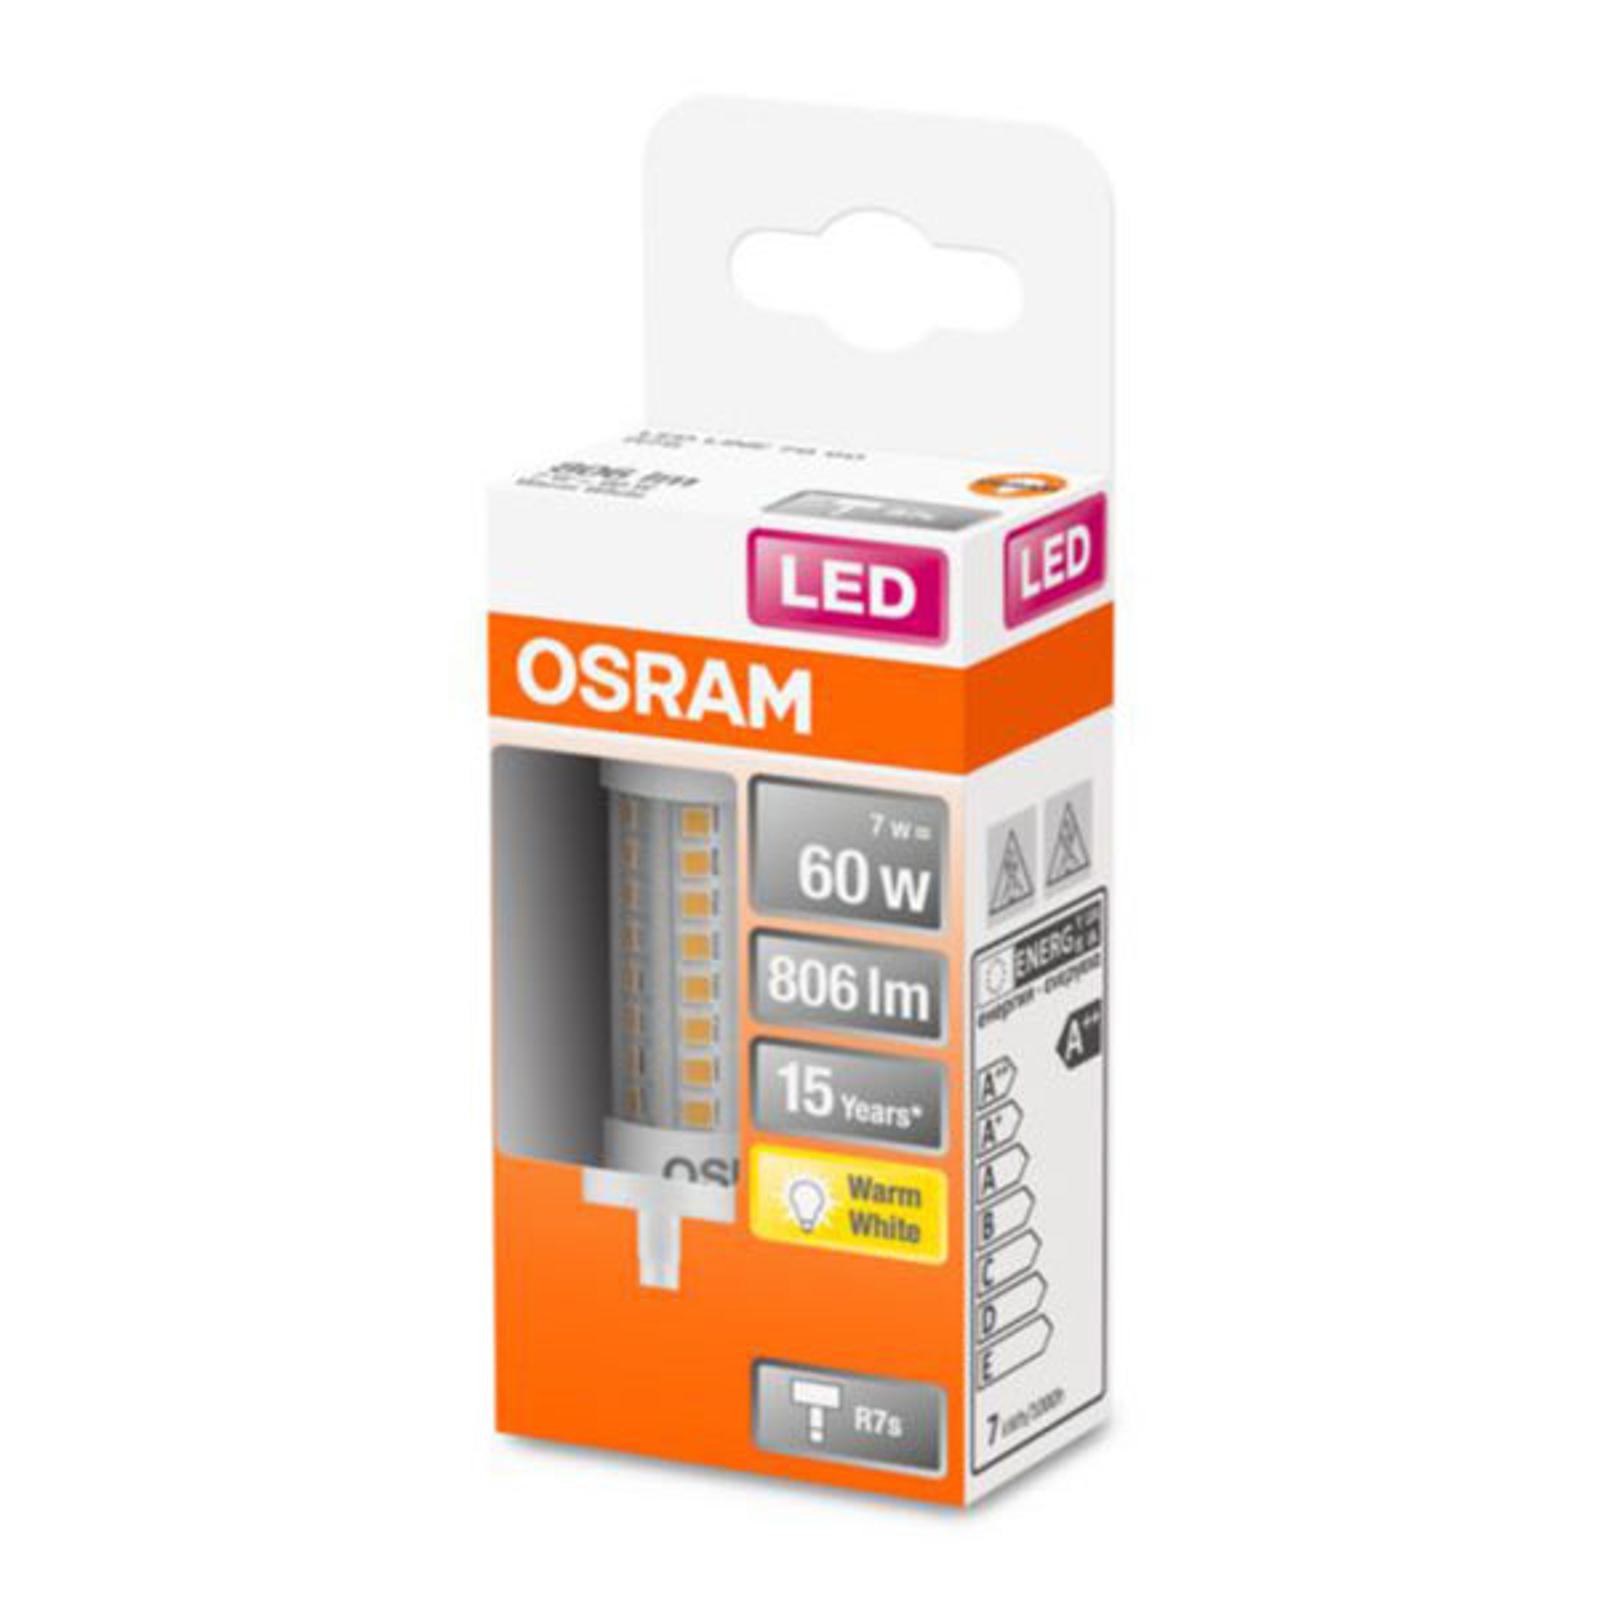 OSRAM-LED-lamppu R7s 7W 2 700 K